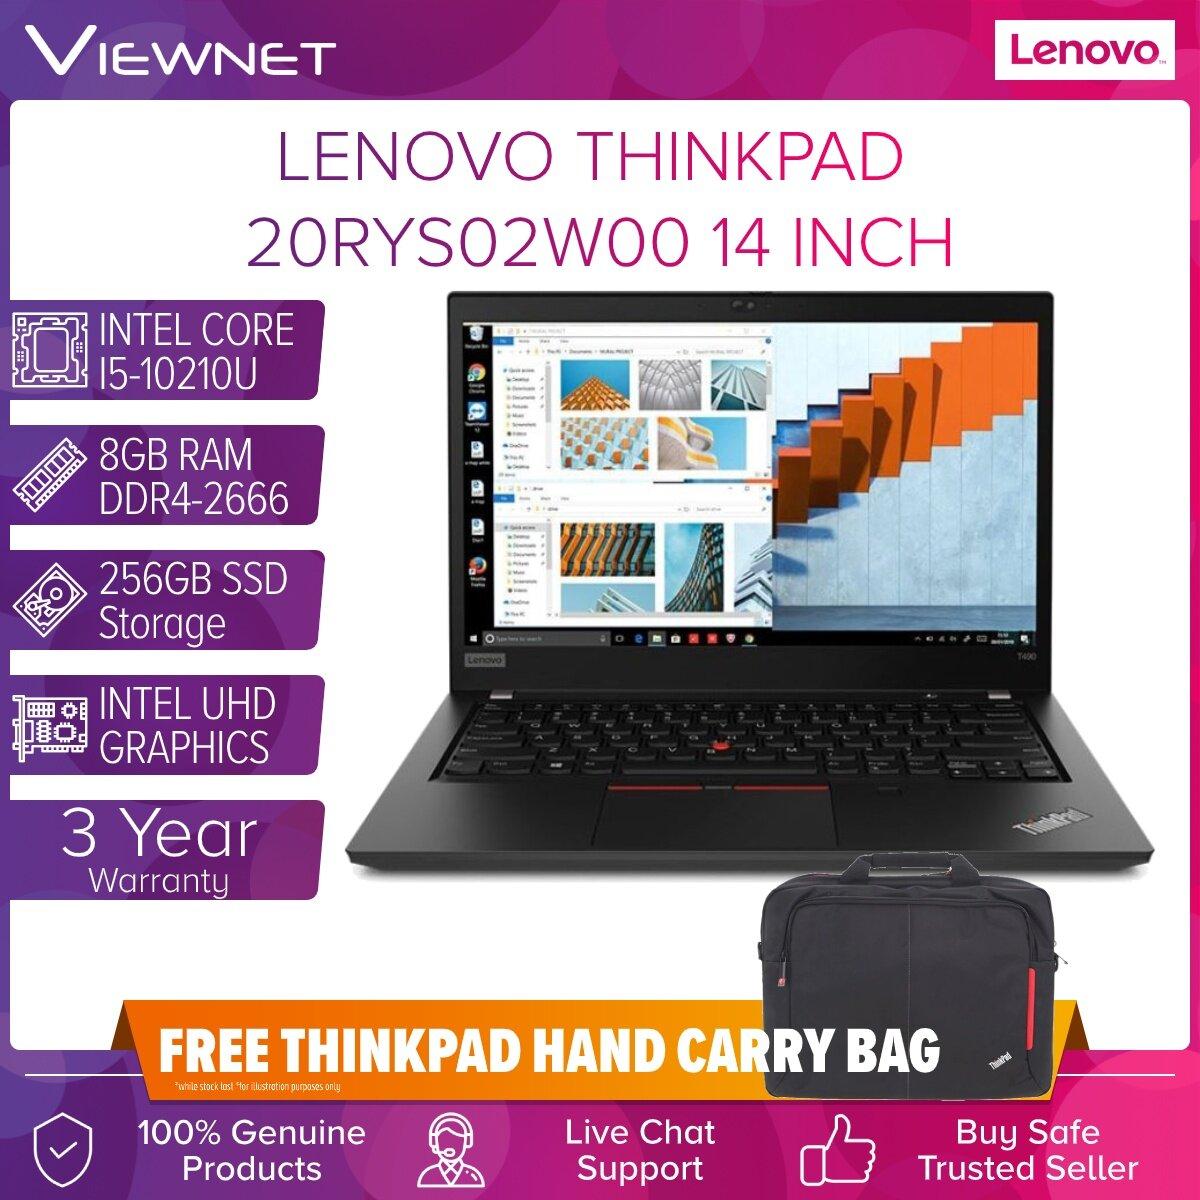 LENOVO THINKPAD T490 20RYS02W00 LAPTOP INTEL CORE I5-10210U 8GB DDR4 ONBOARD 256GB INTEL HD W10P 14